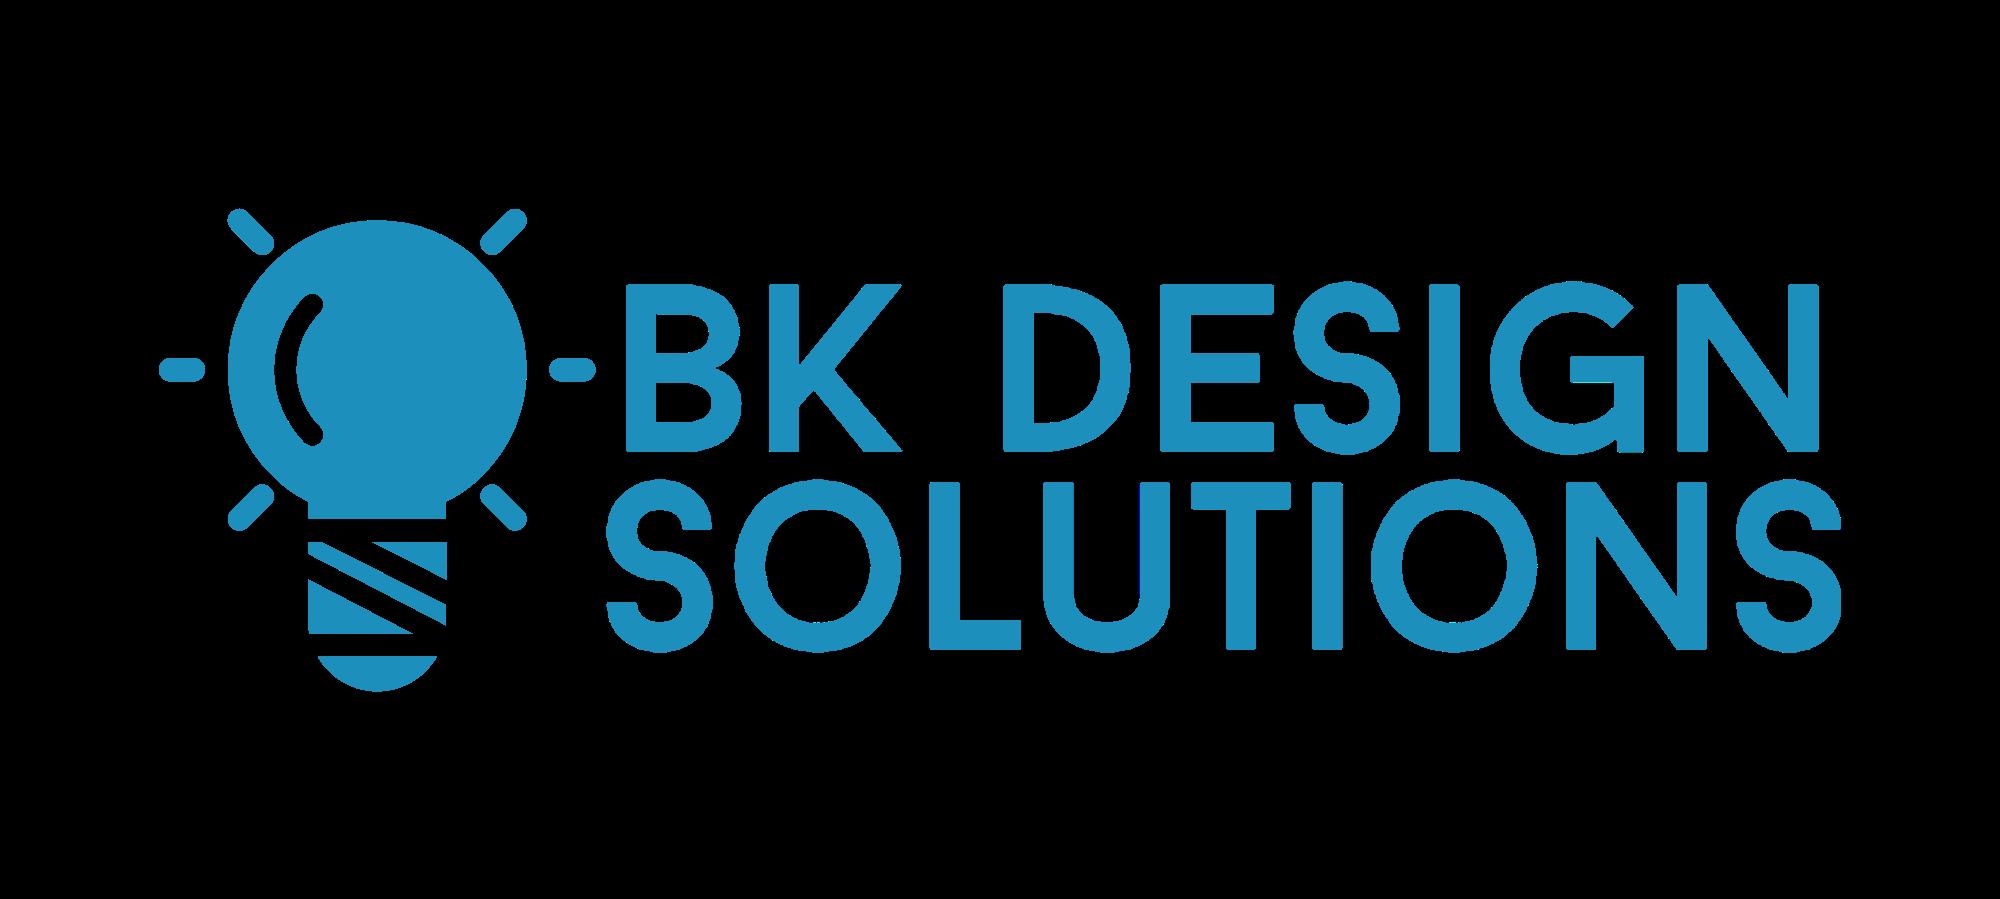 BK Design Solutions